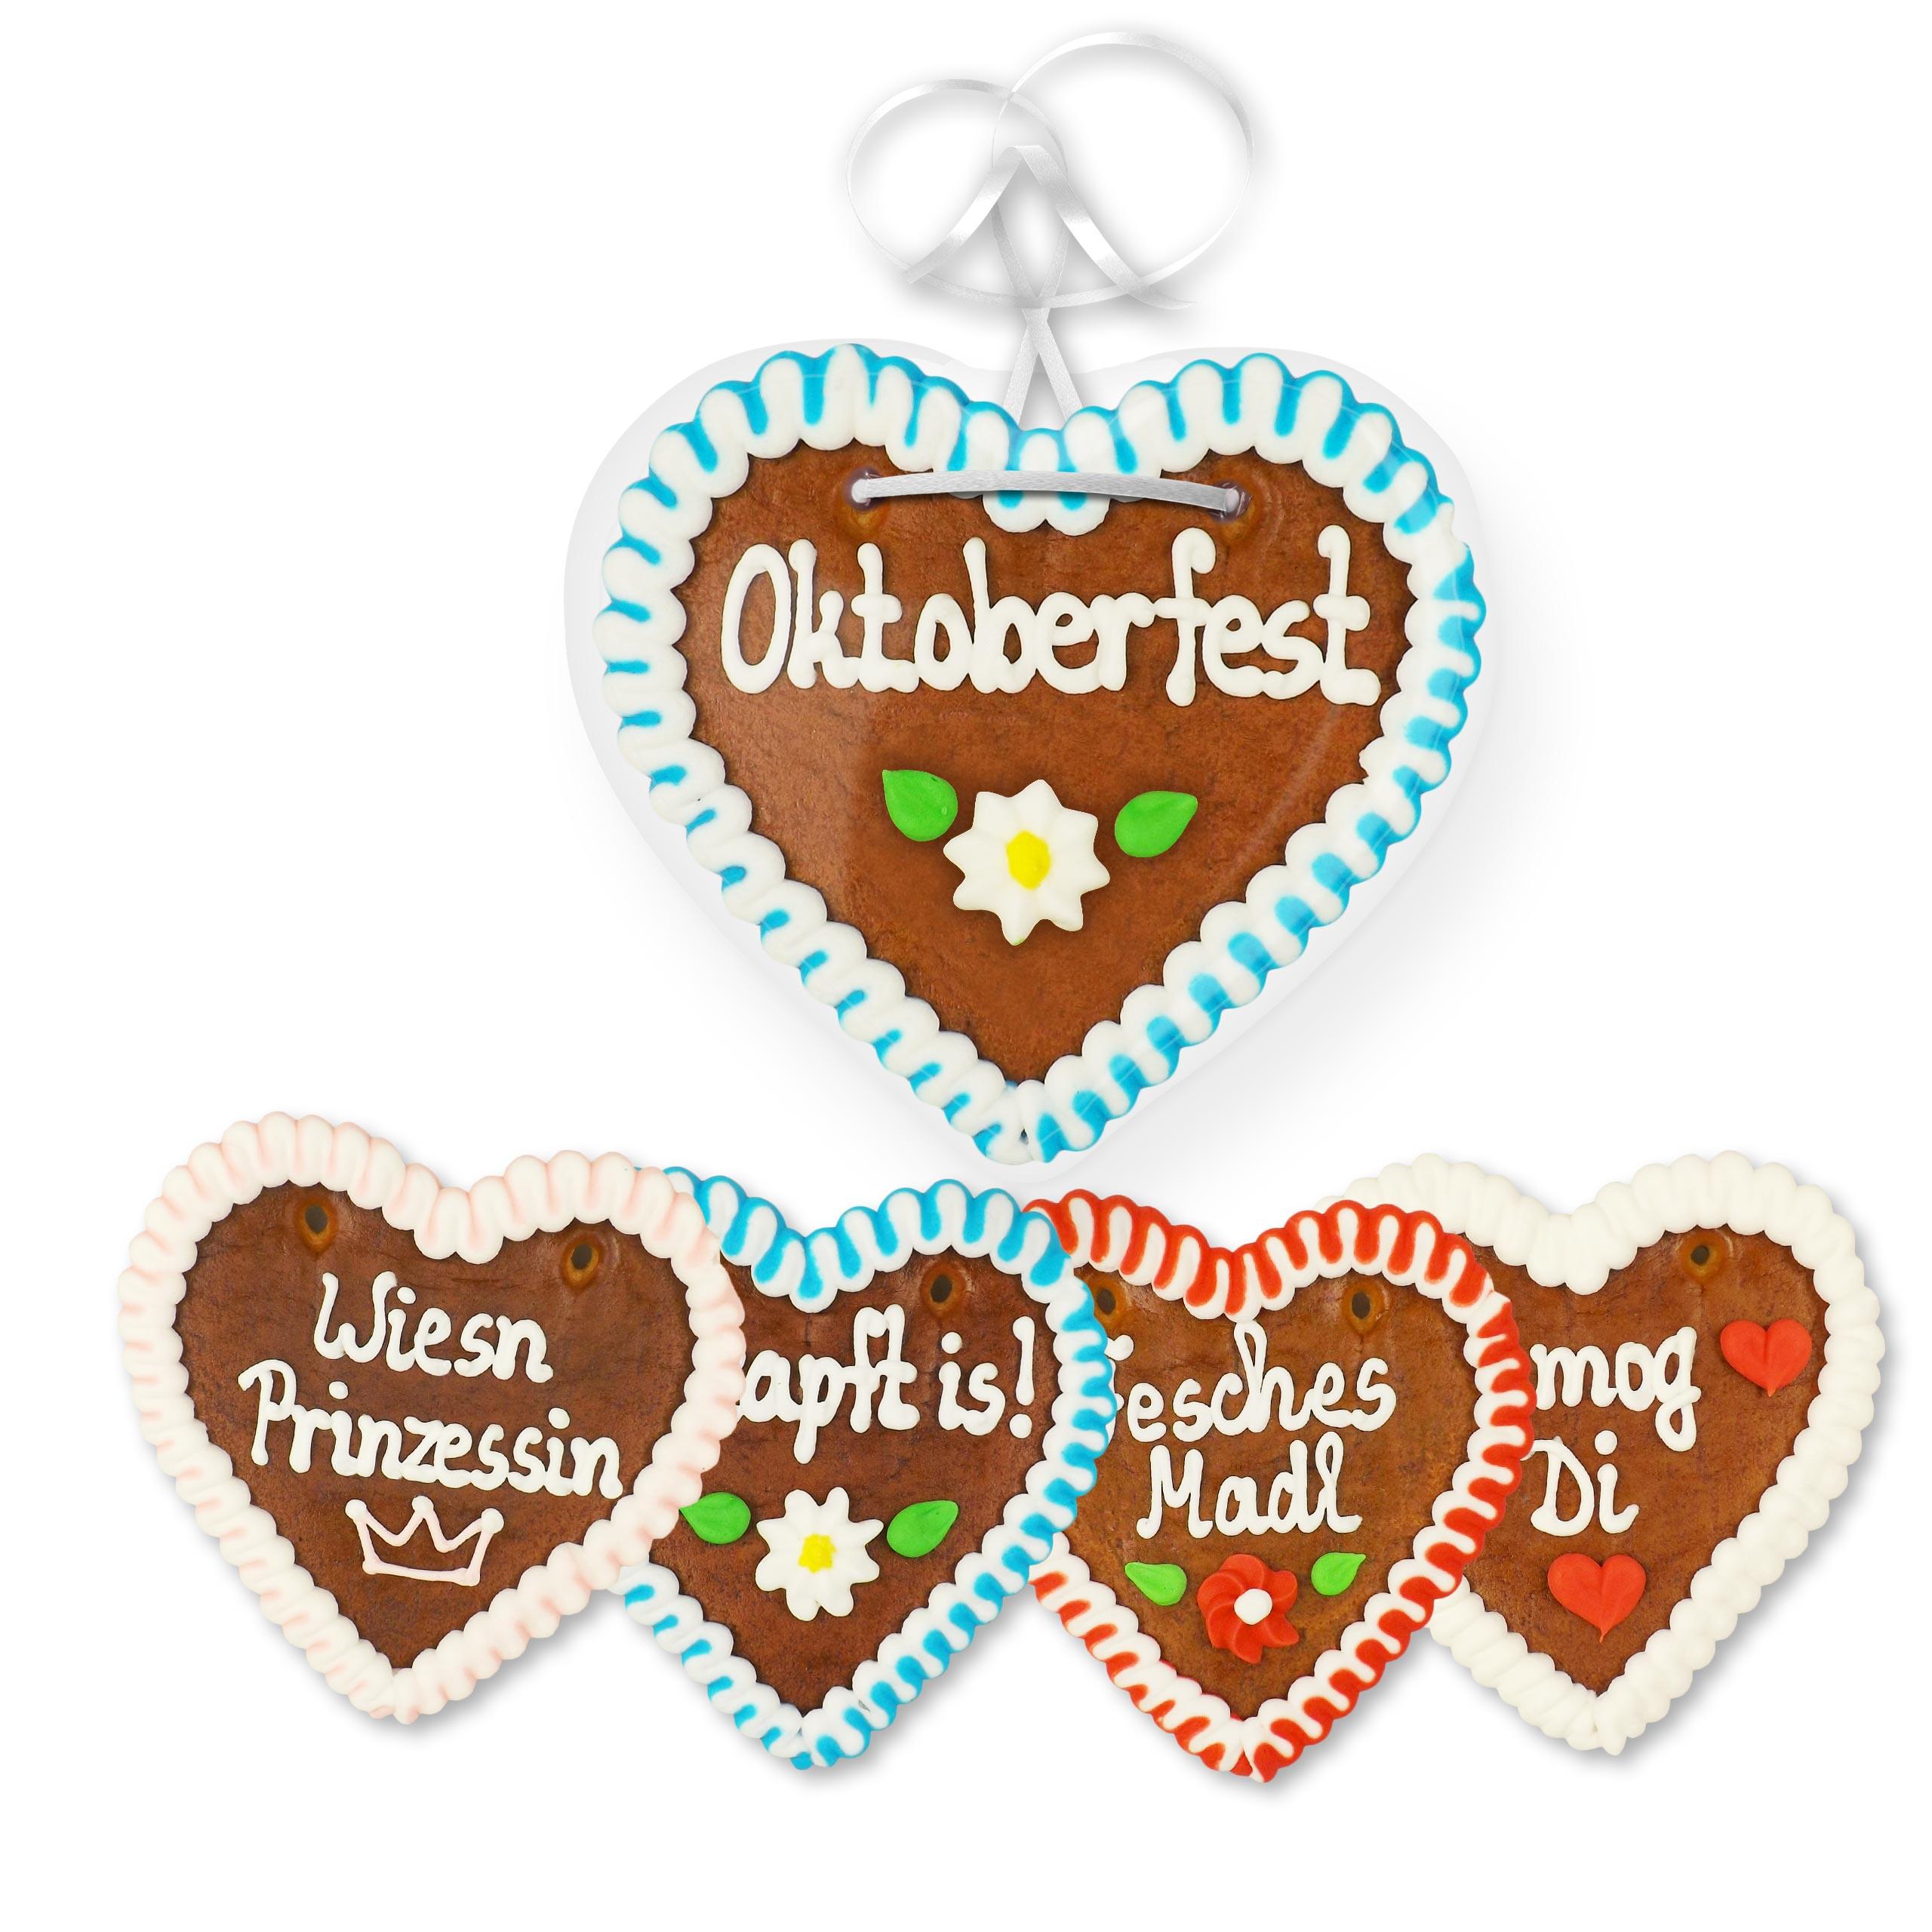 Oktoberfest Sprüche